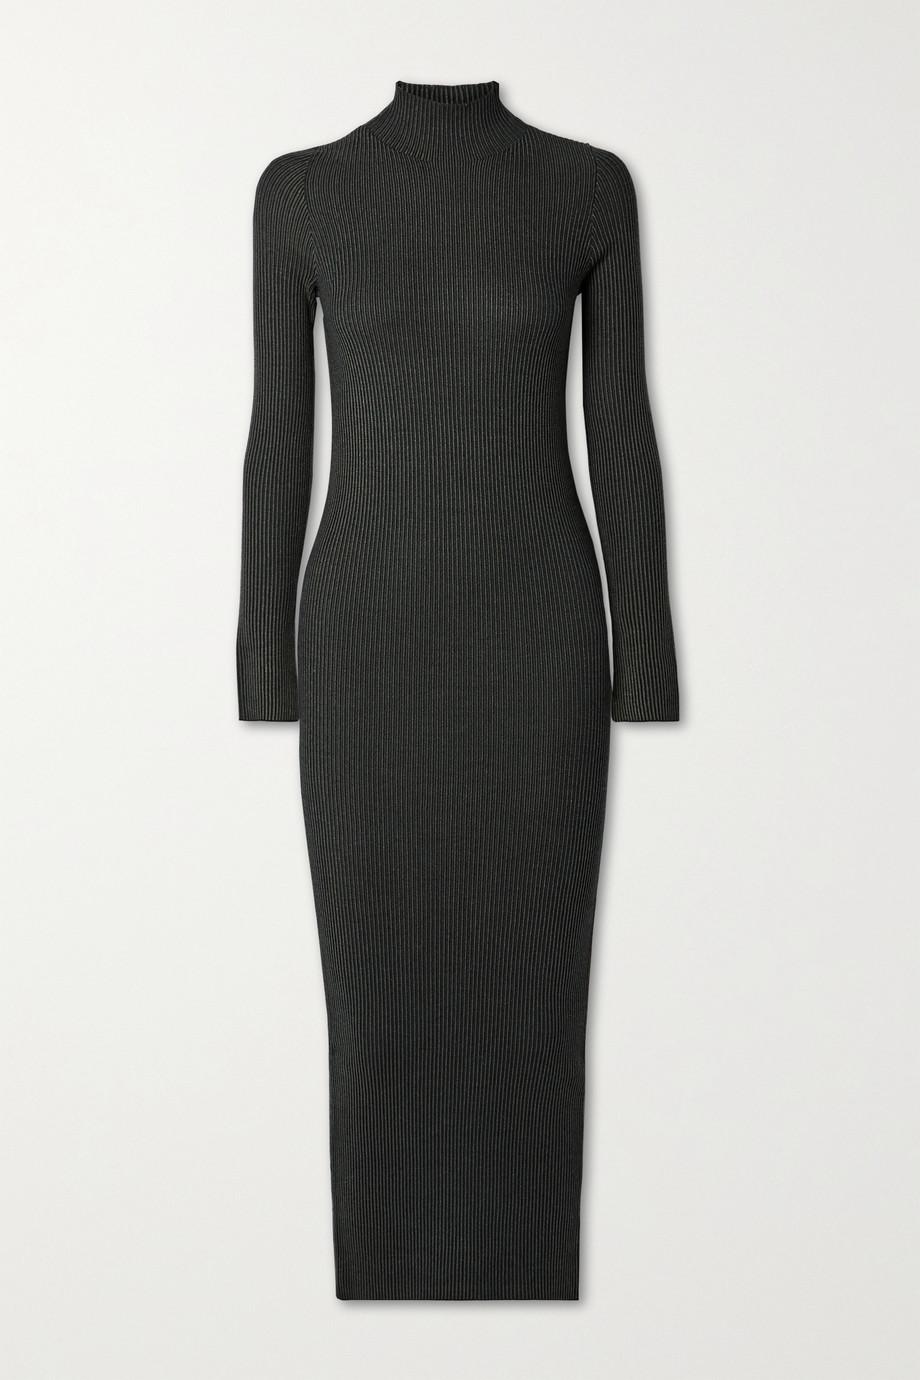 By Malene Birger Cavea ribbed-knit midi dress